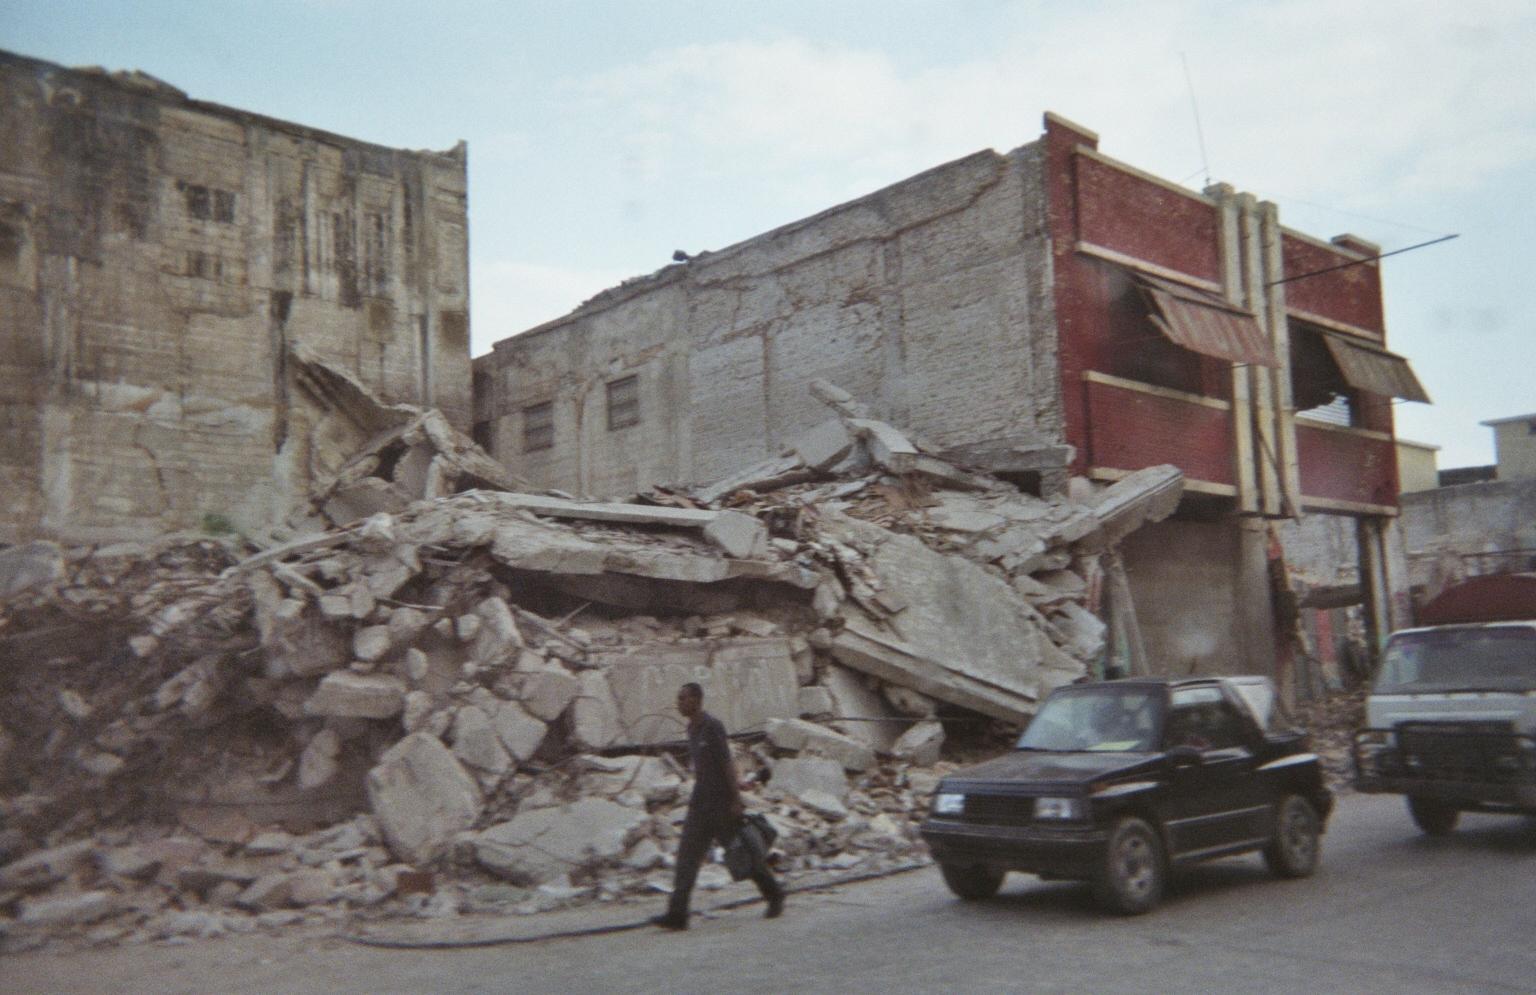 <em><strong>Commuters pass by a collapsed building, a common sight in Port-au-Prince, Haiti (Photo courtesy Dr. Hélène Rousseau)</em></strong>